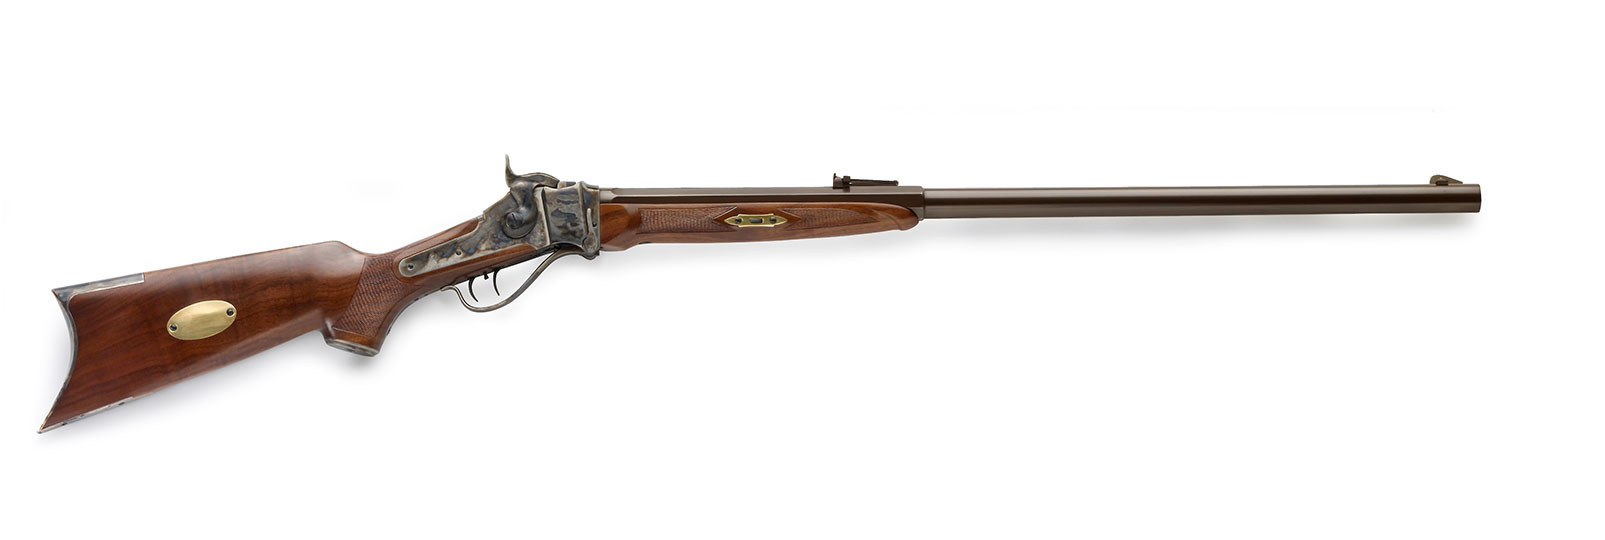 1874 sharps old west walnut .45-70